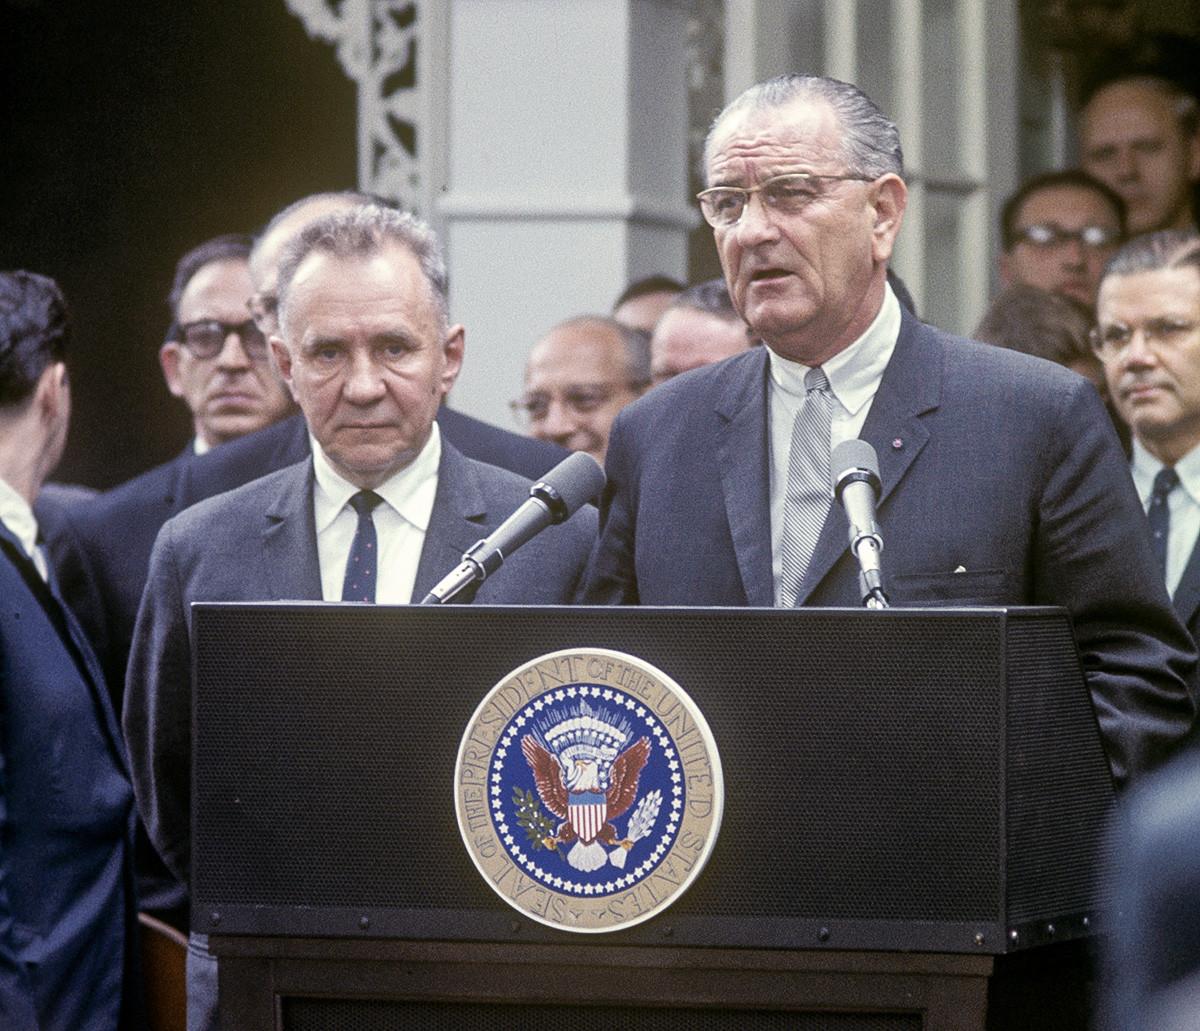 Aleksej Kosigin i predsjednik Lyndon Johnson na summitu u Glassborou, lipanj 1967.